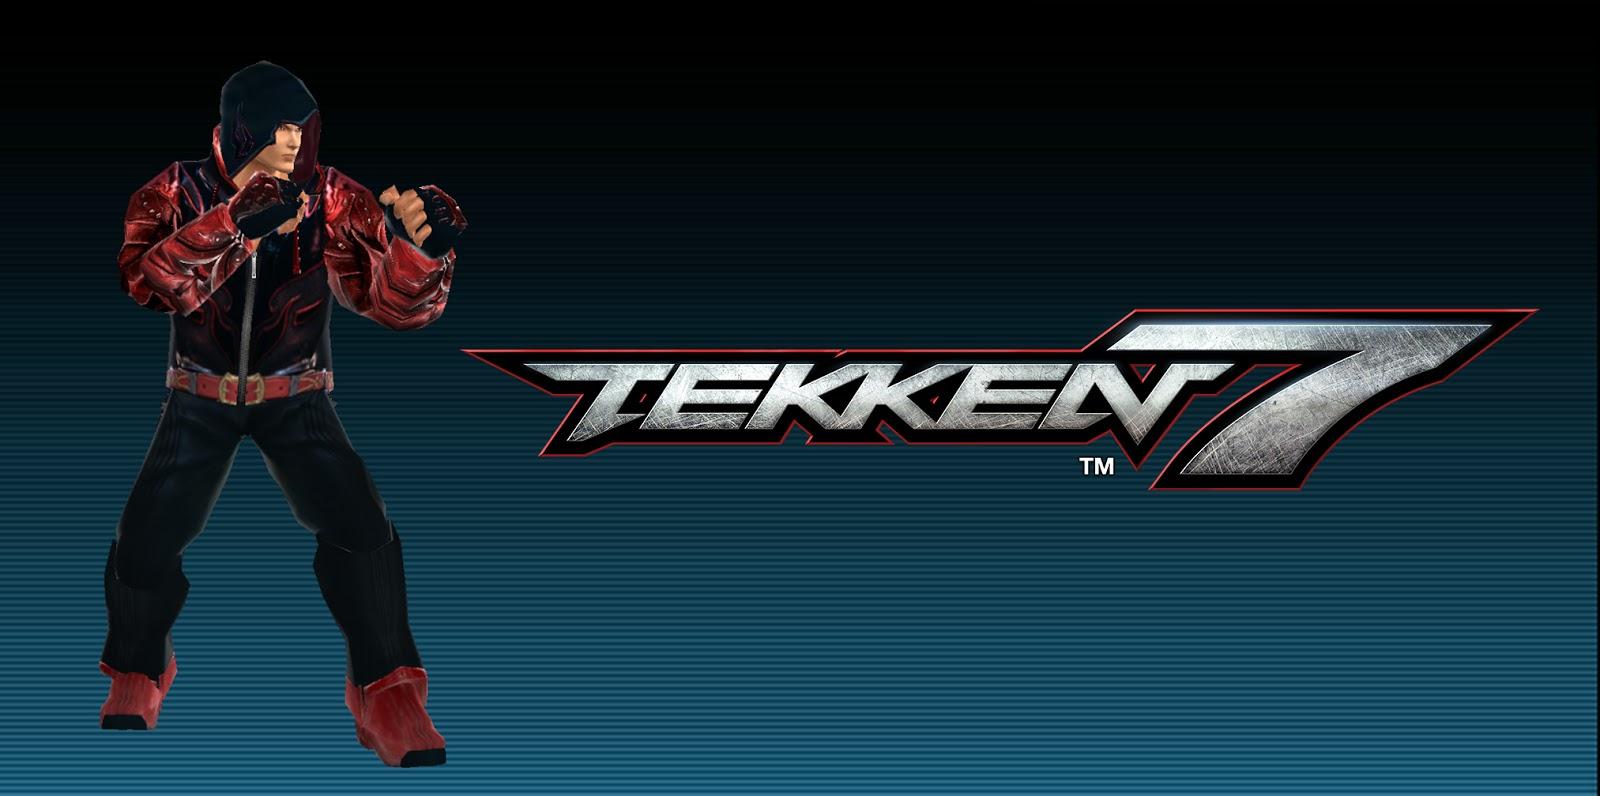 DOWNLOAD - TEKKEN 7 PROJECT MOD PROJECT by Tekken Philippines PPSSPP